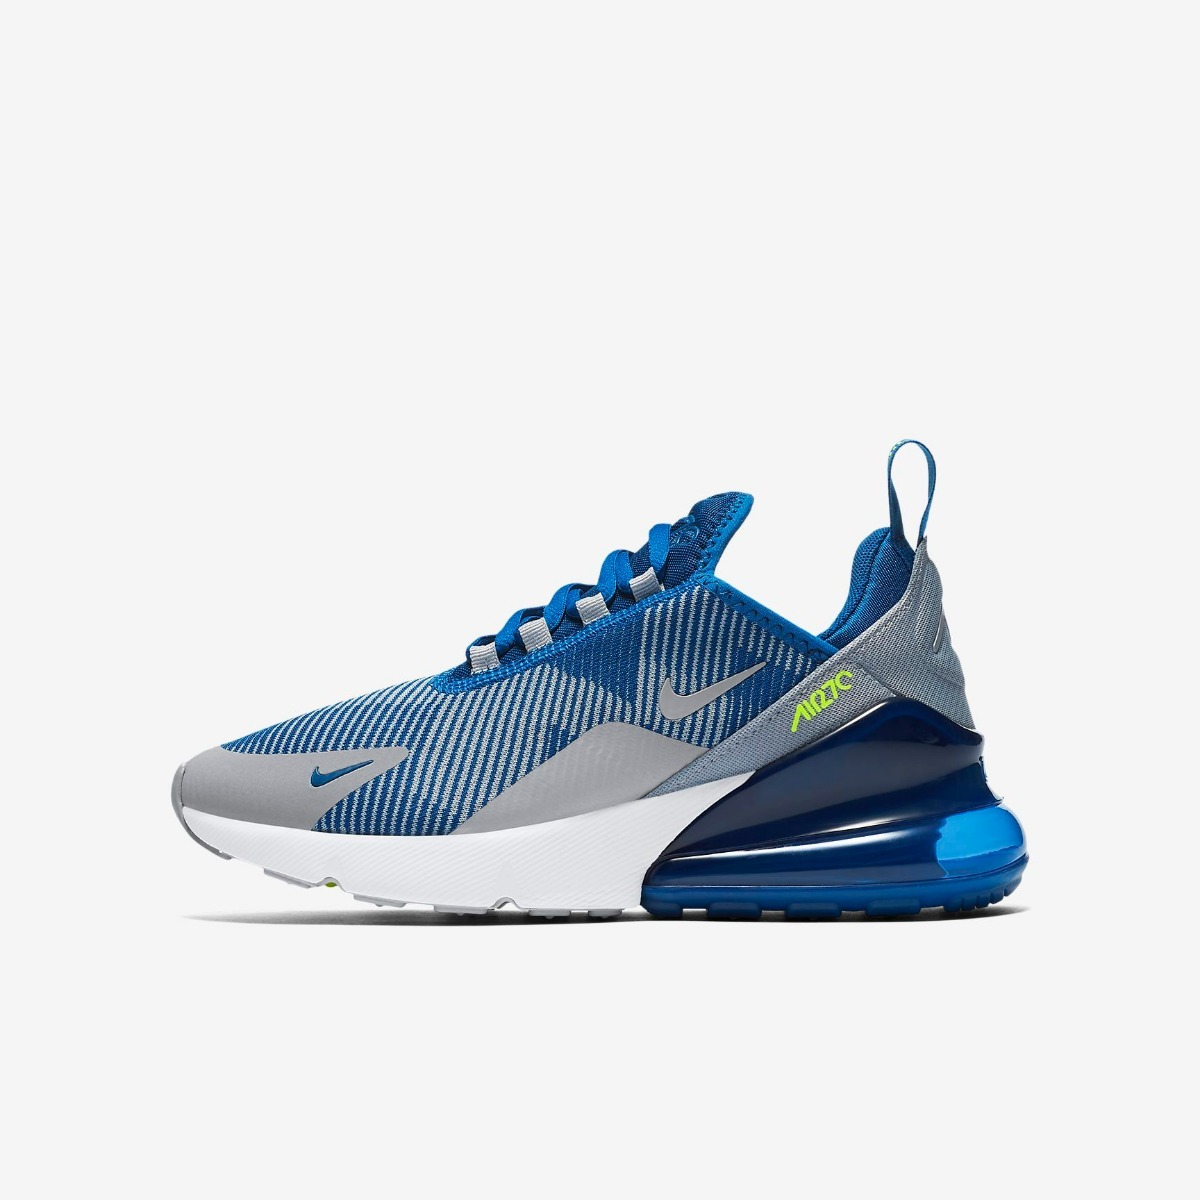 new style a7020 50c70 zapatos tenis nike air max 270 jacquard mujer 100% original. Cargando zoom.